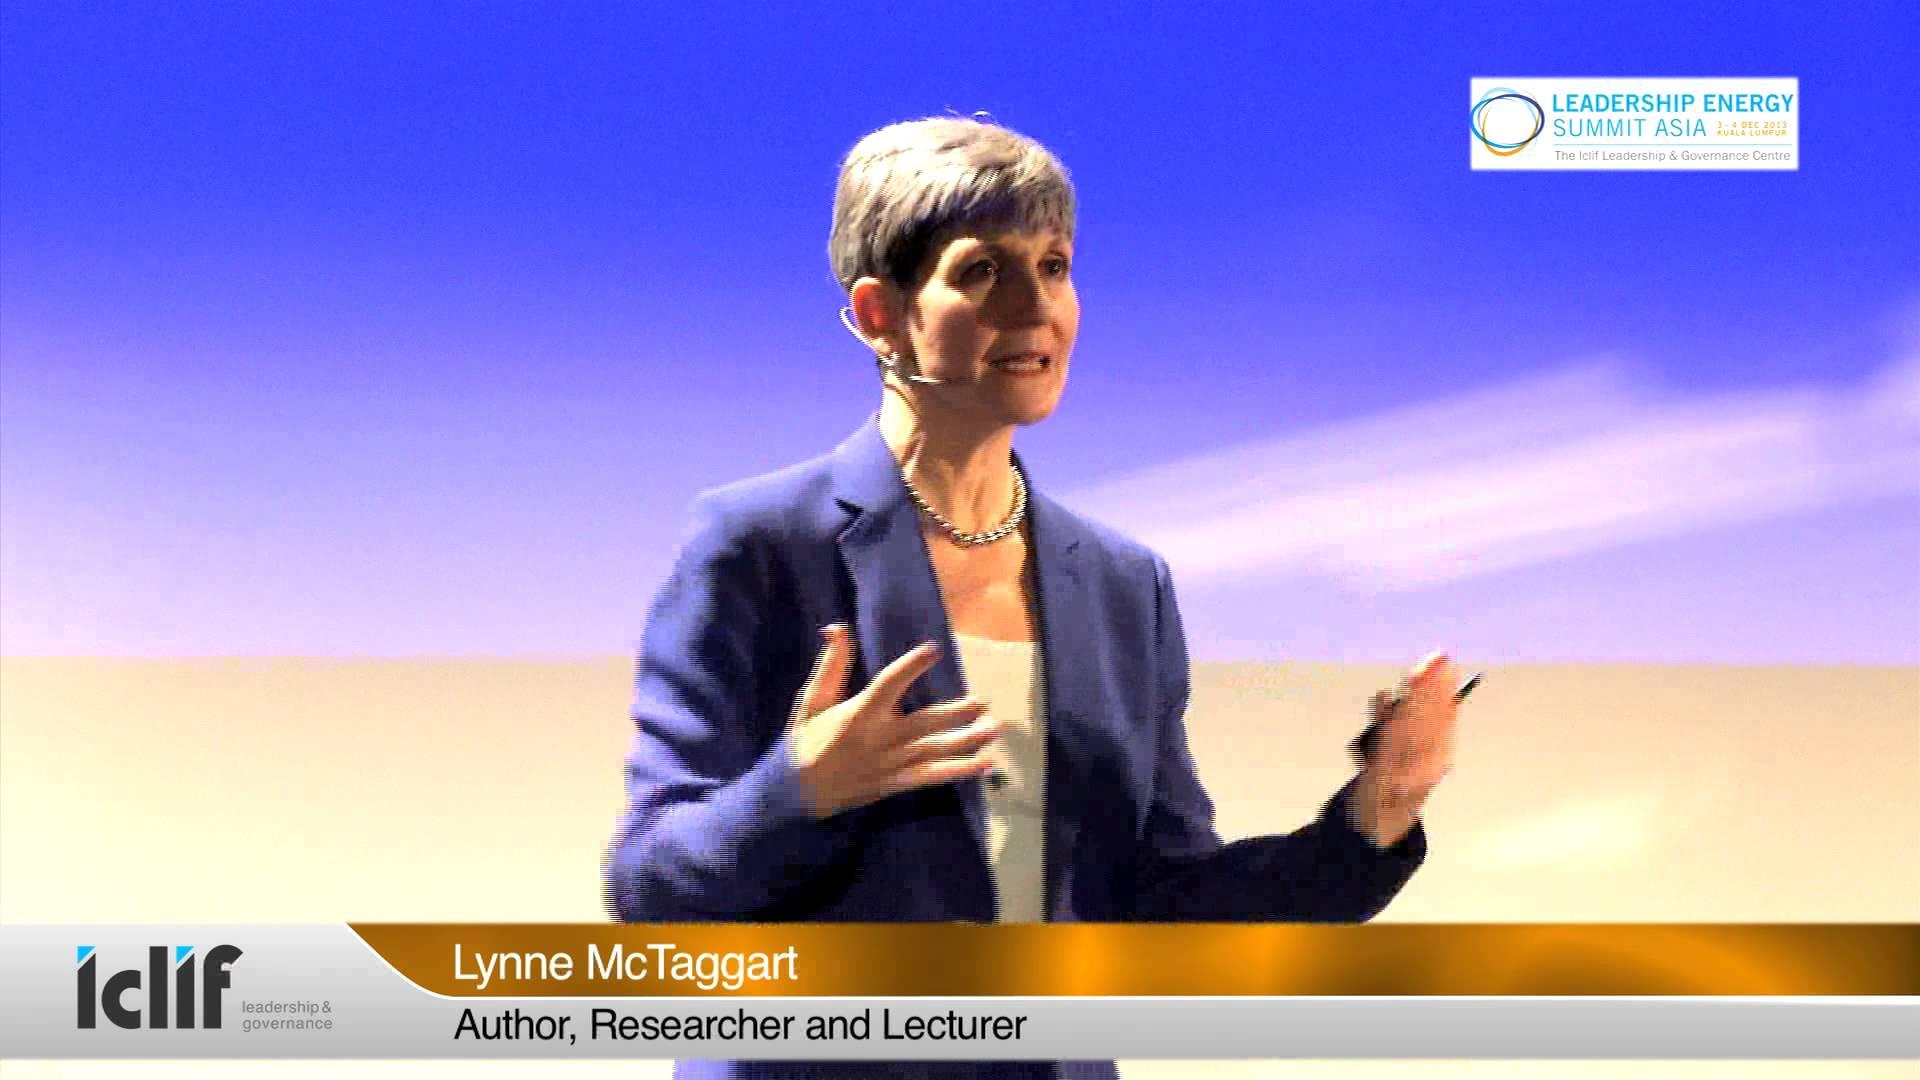 lynne-mctaggart-8211-leadership-energy-summit.jpg